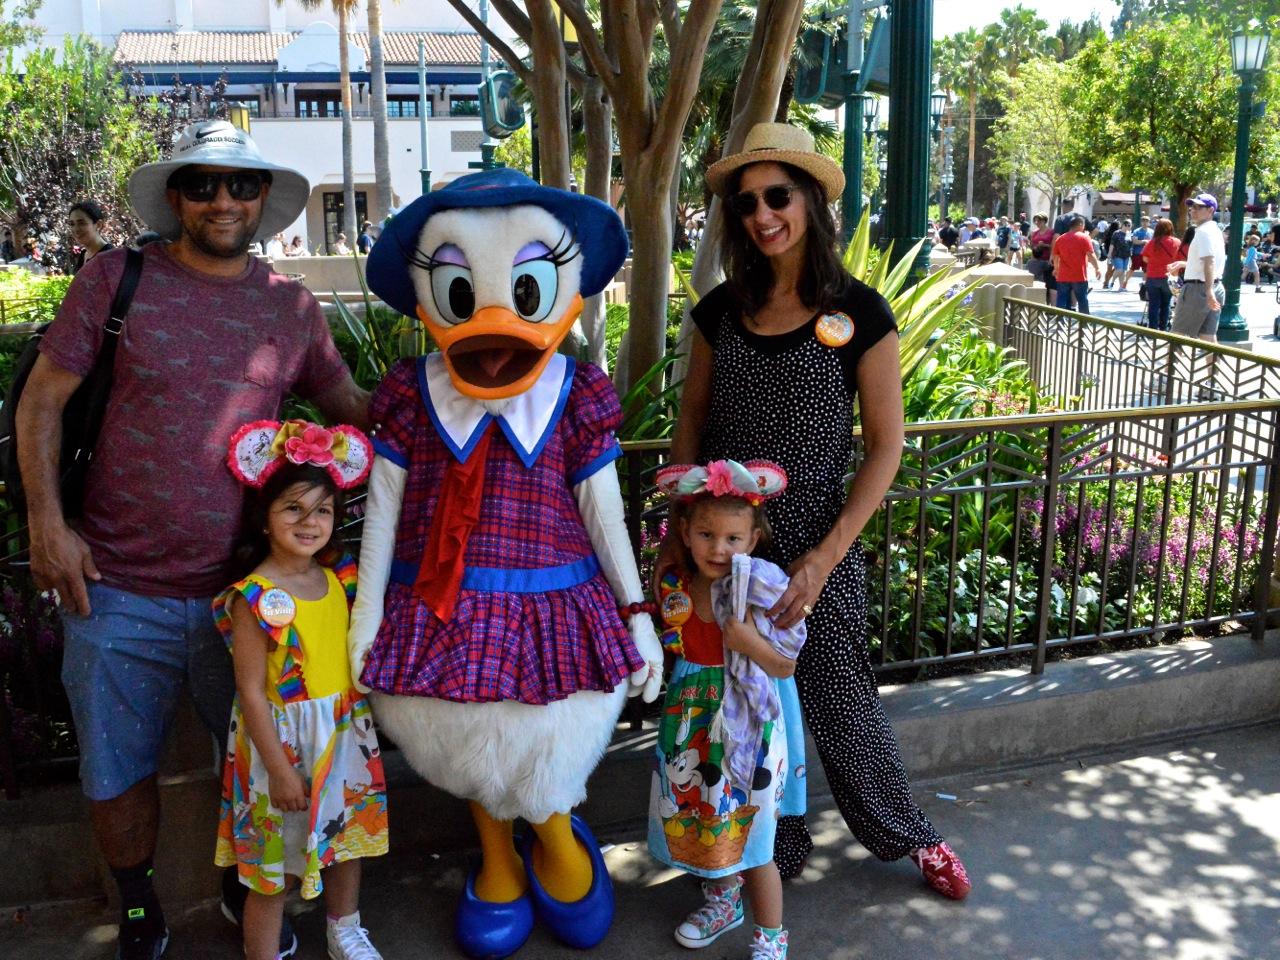 Disneyland California Adventureland with Toddlers July 2018 10.jpg